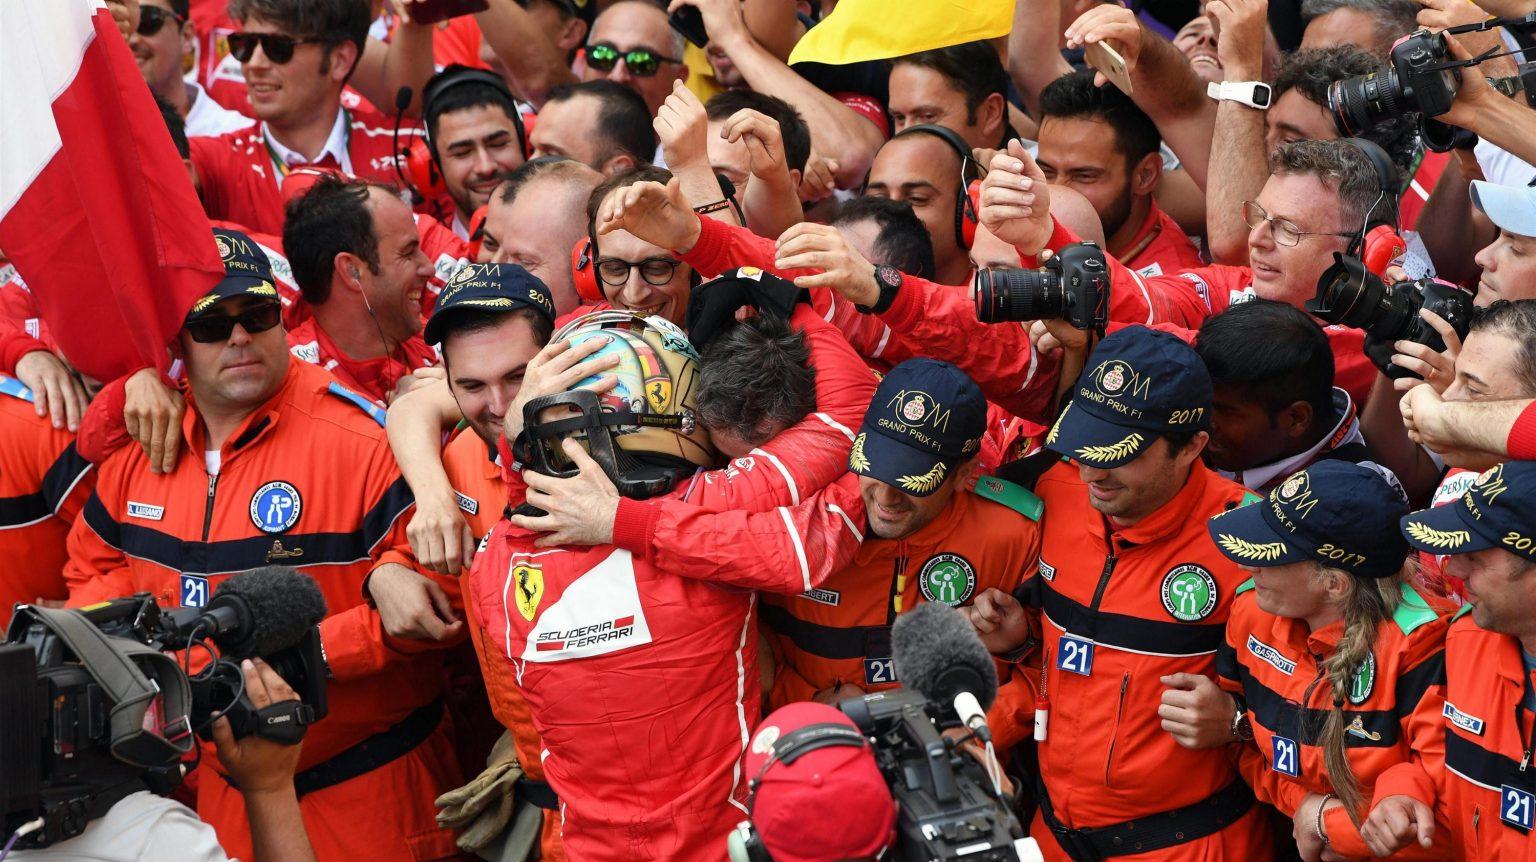 GP Monaco 2017 Vettel Ferrari